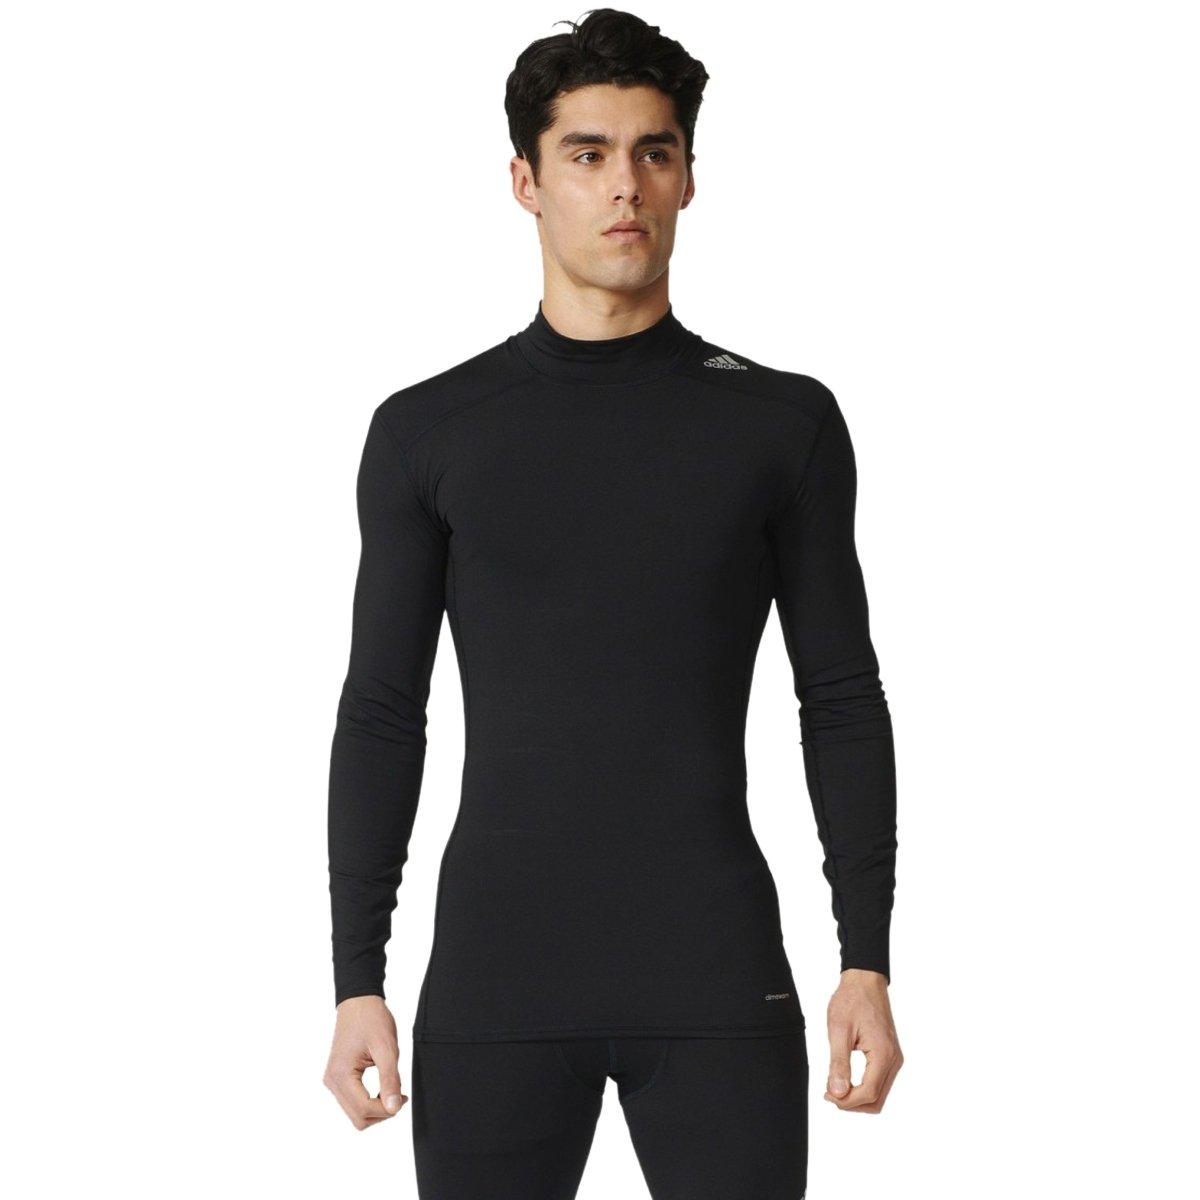 Bizz Store - Camiseta de Compressão Masculina Adidas TF Base Mock 48e7664205f8d